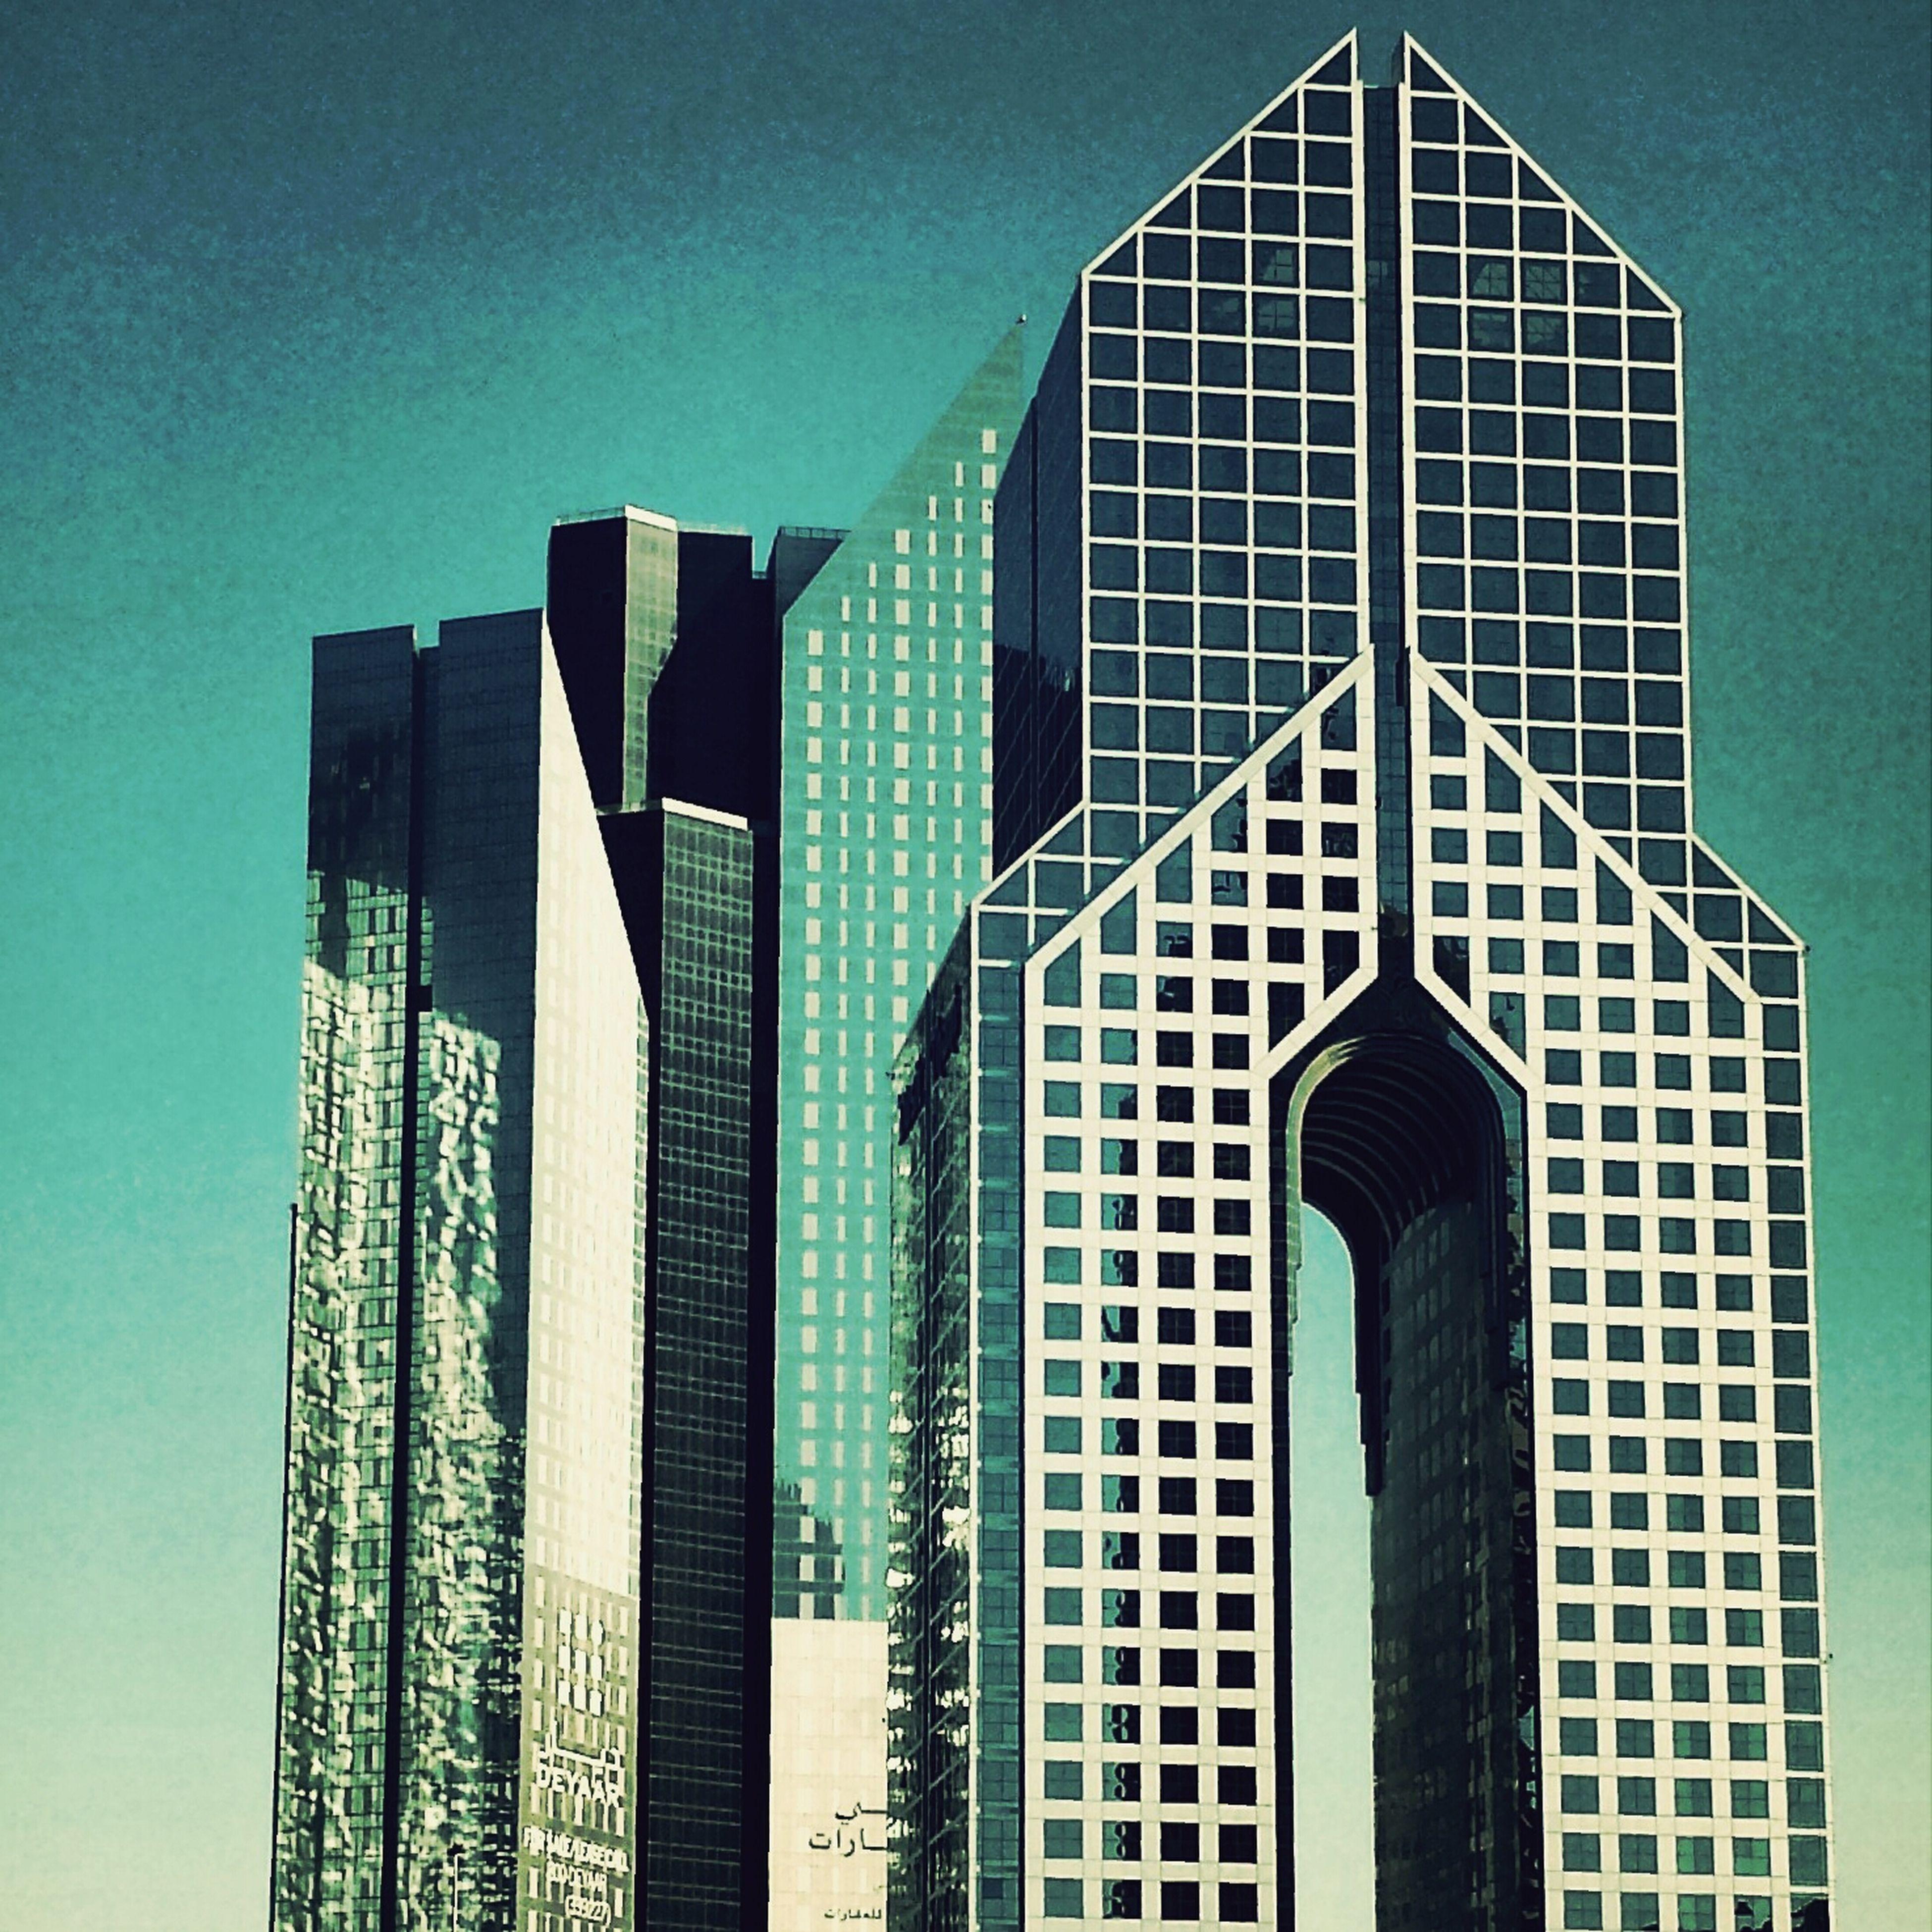 Urban Geometry Cityscapes City 2.0 - The Future Of The City Dubai